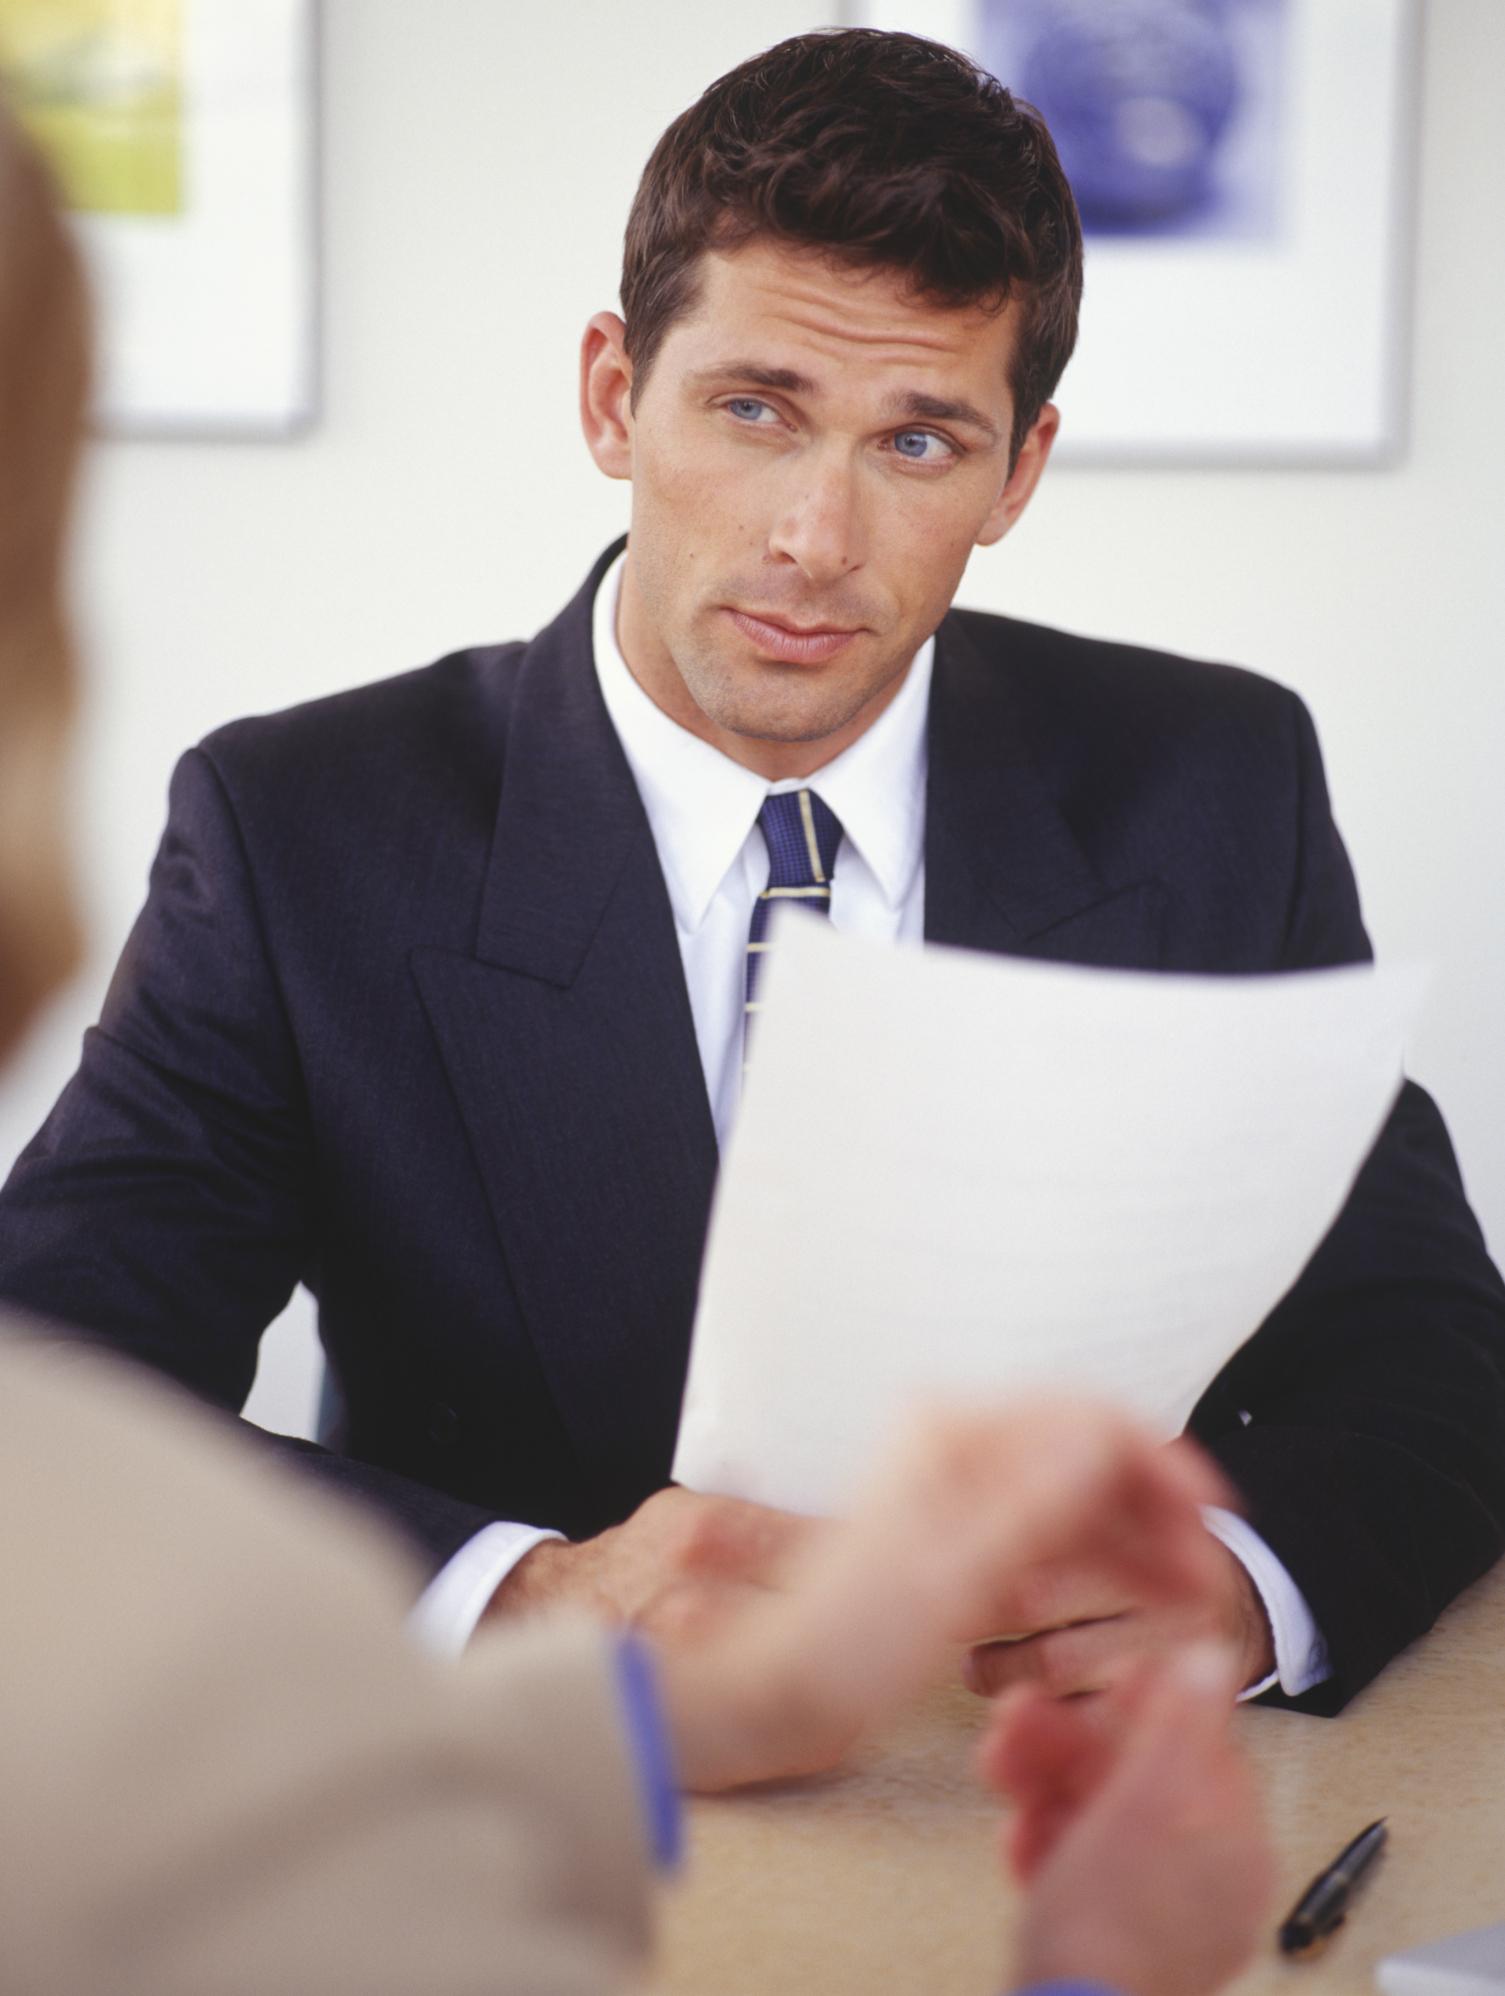 inquiring about a job